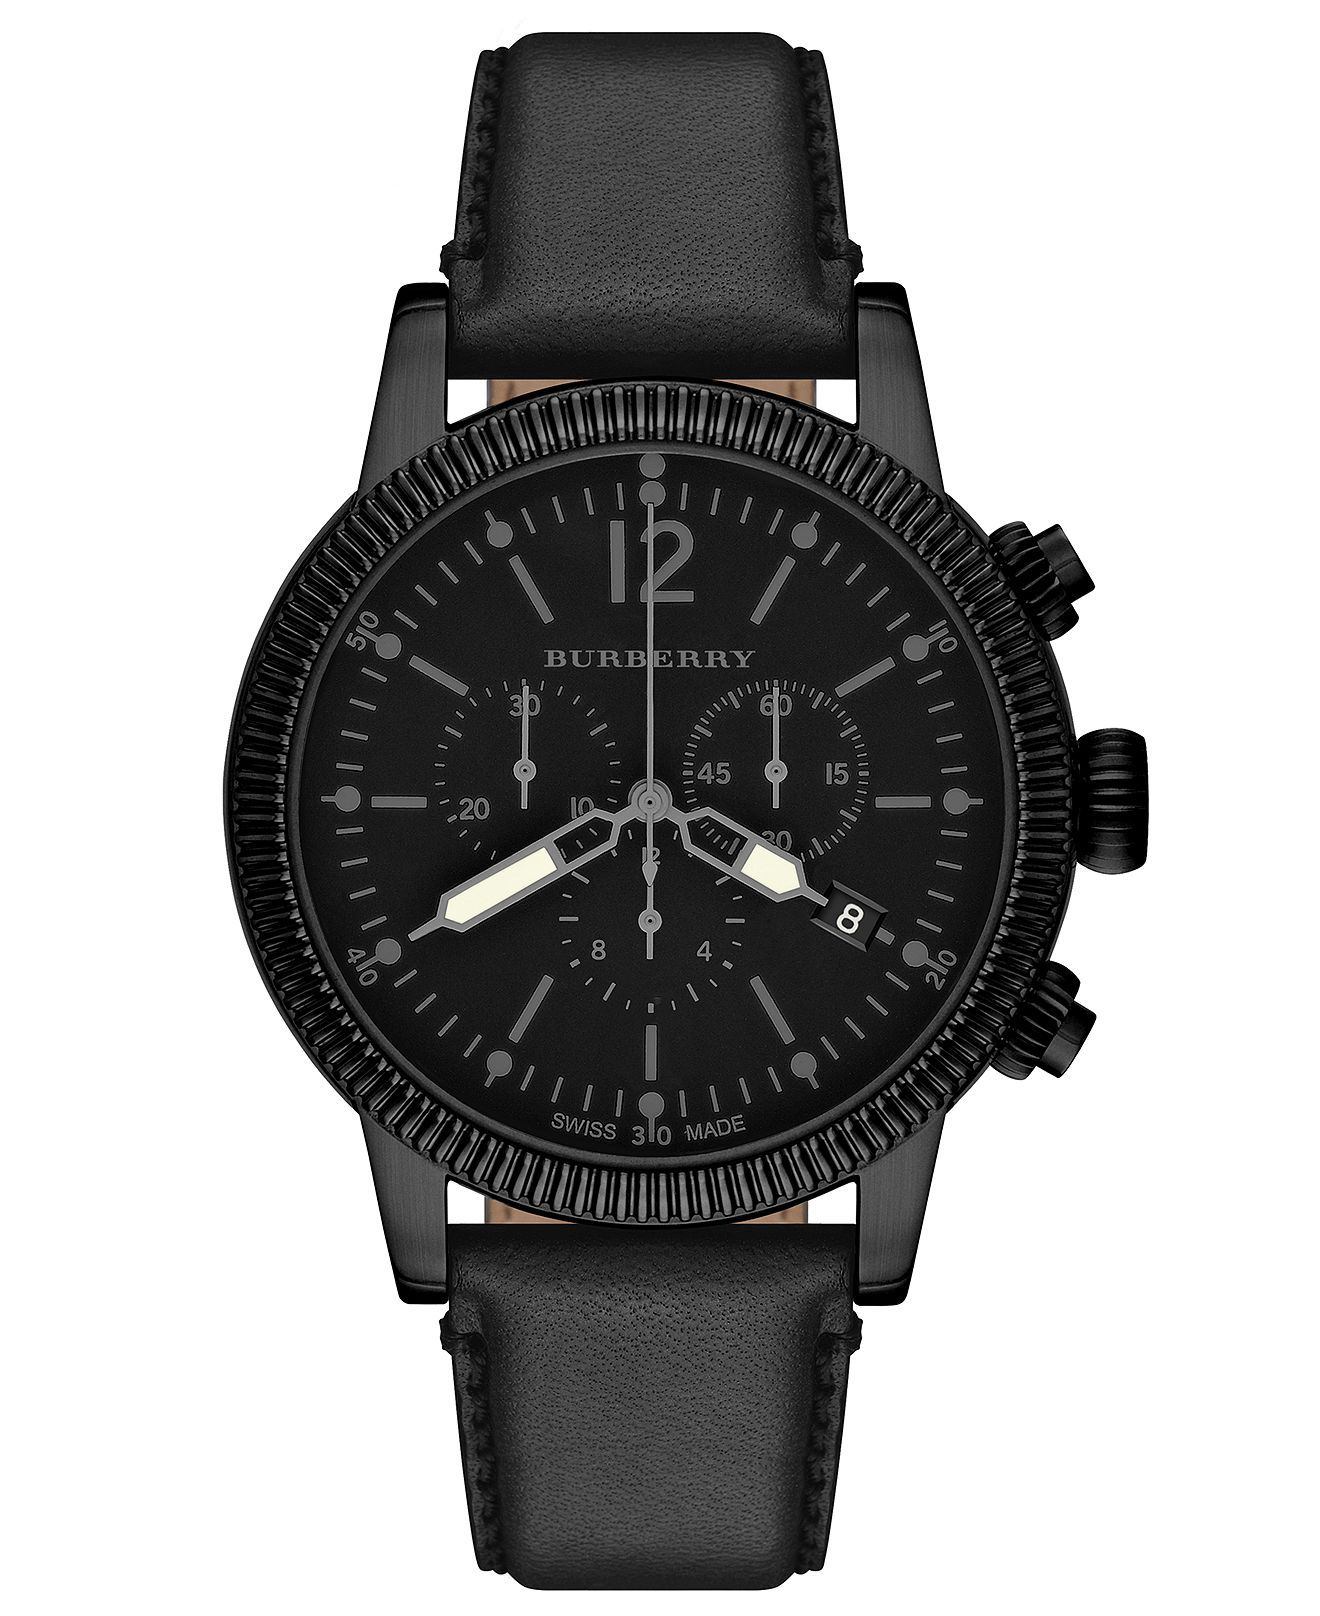 795 Burberry Watch af2528b786e